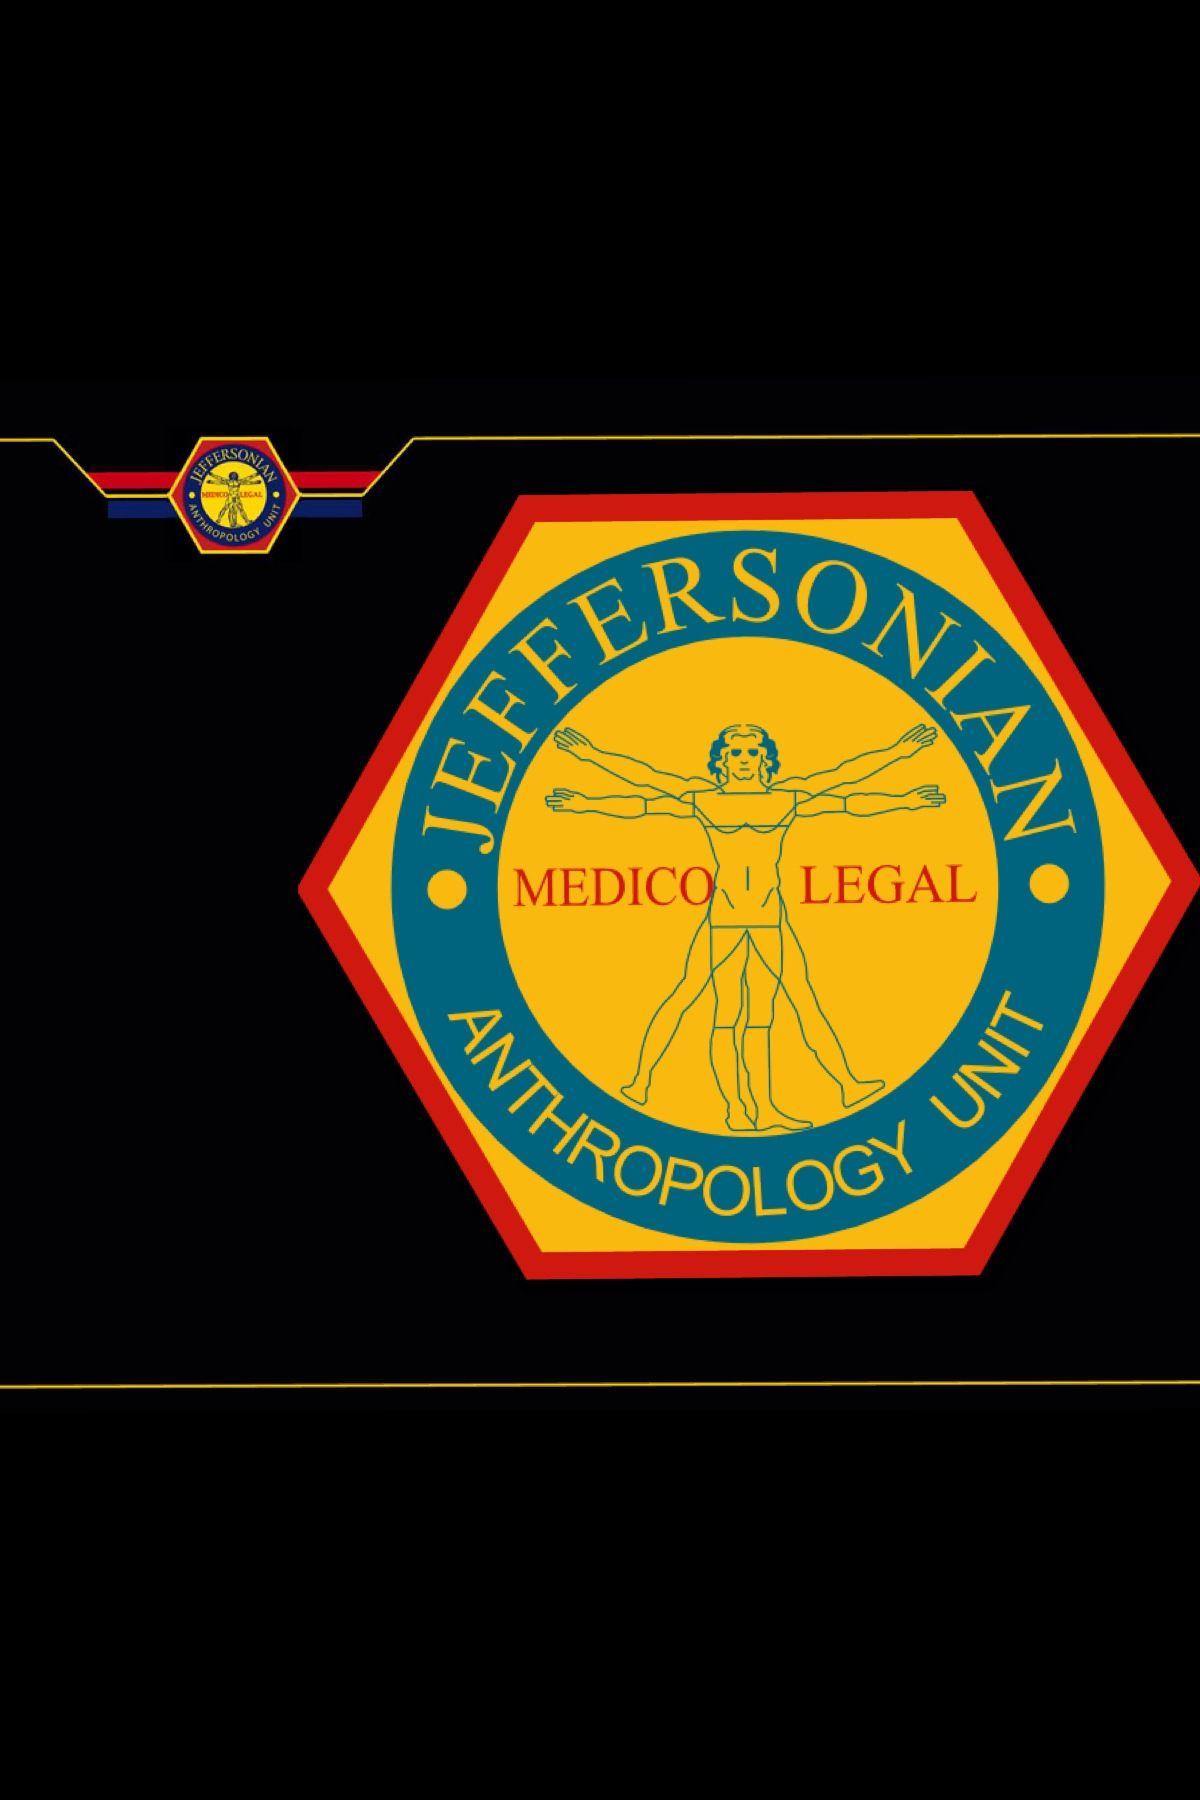 Jeffersonian Logo Plantas